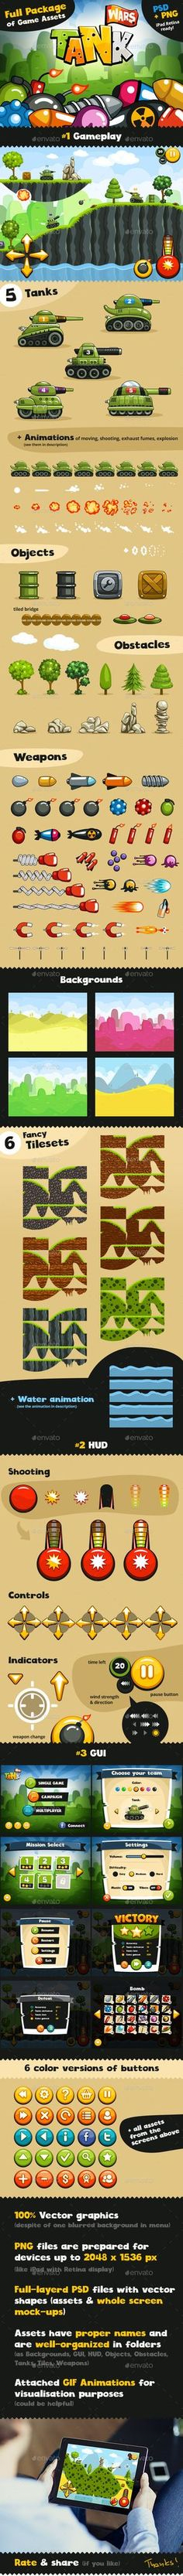 0287b065d7f Game Assets for Tank Wars - Game Kits Game Assets § Find more artworks  www